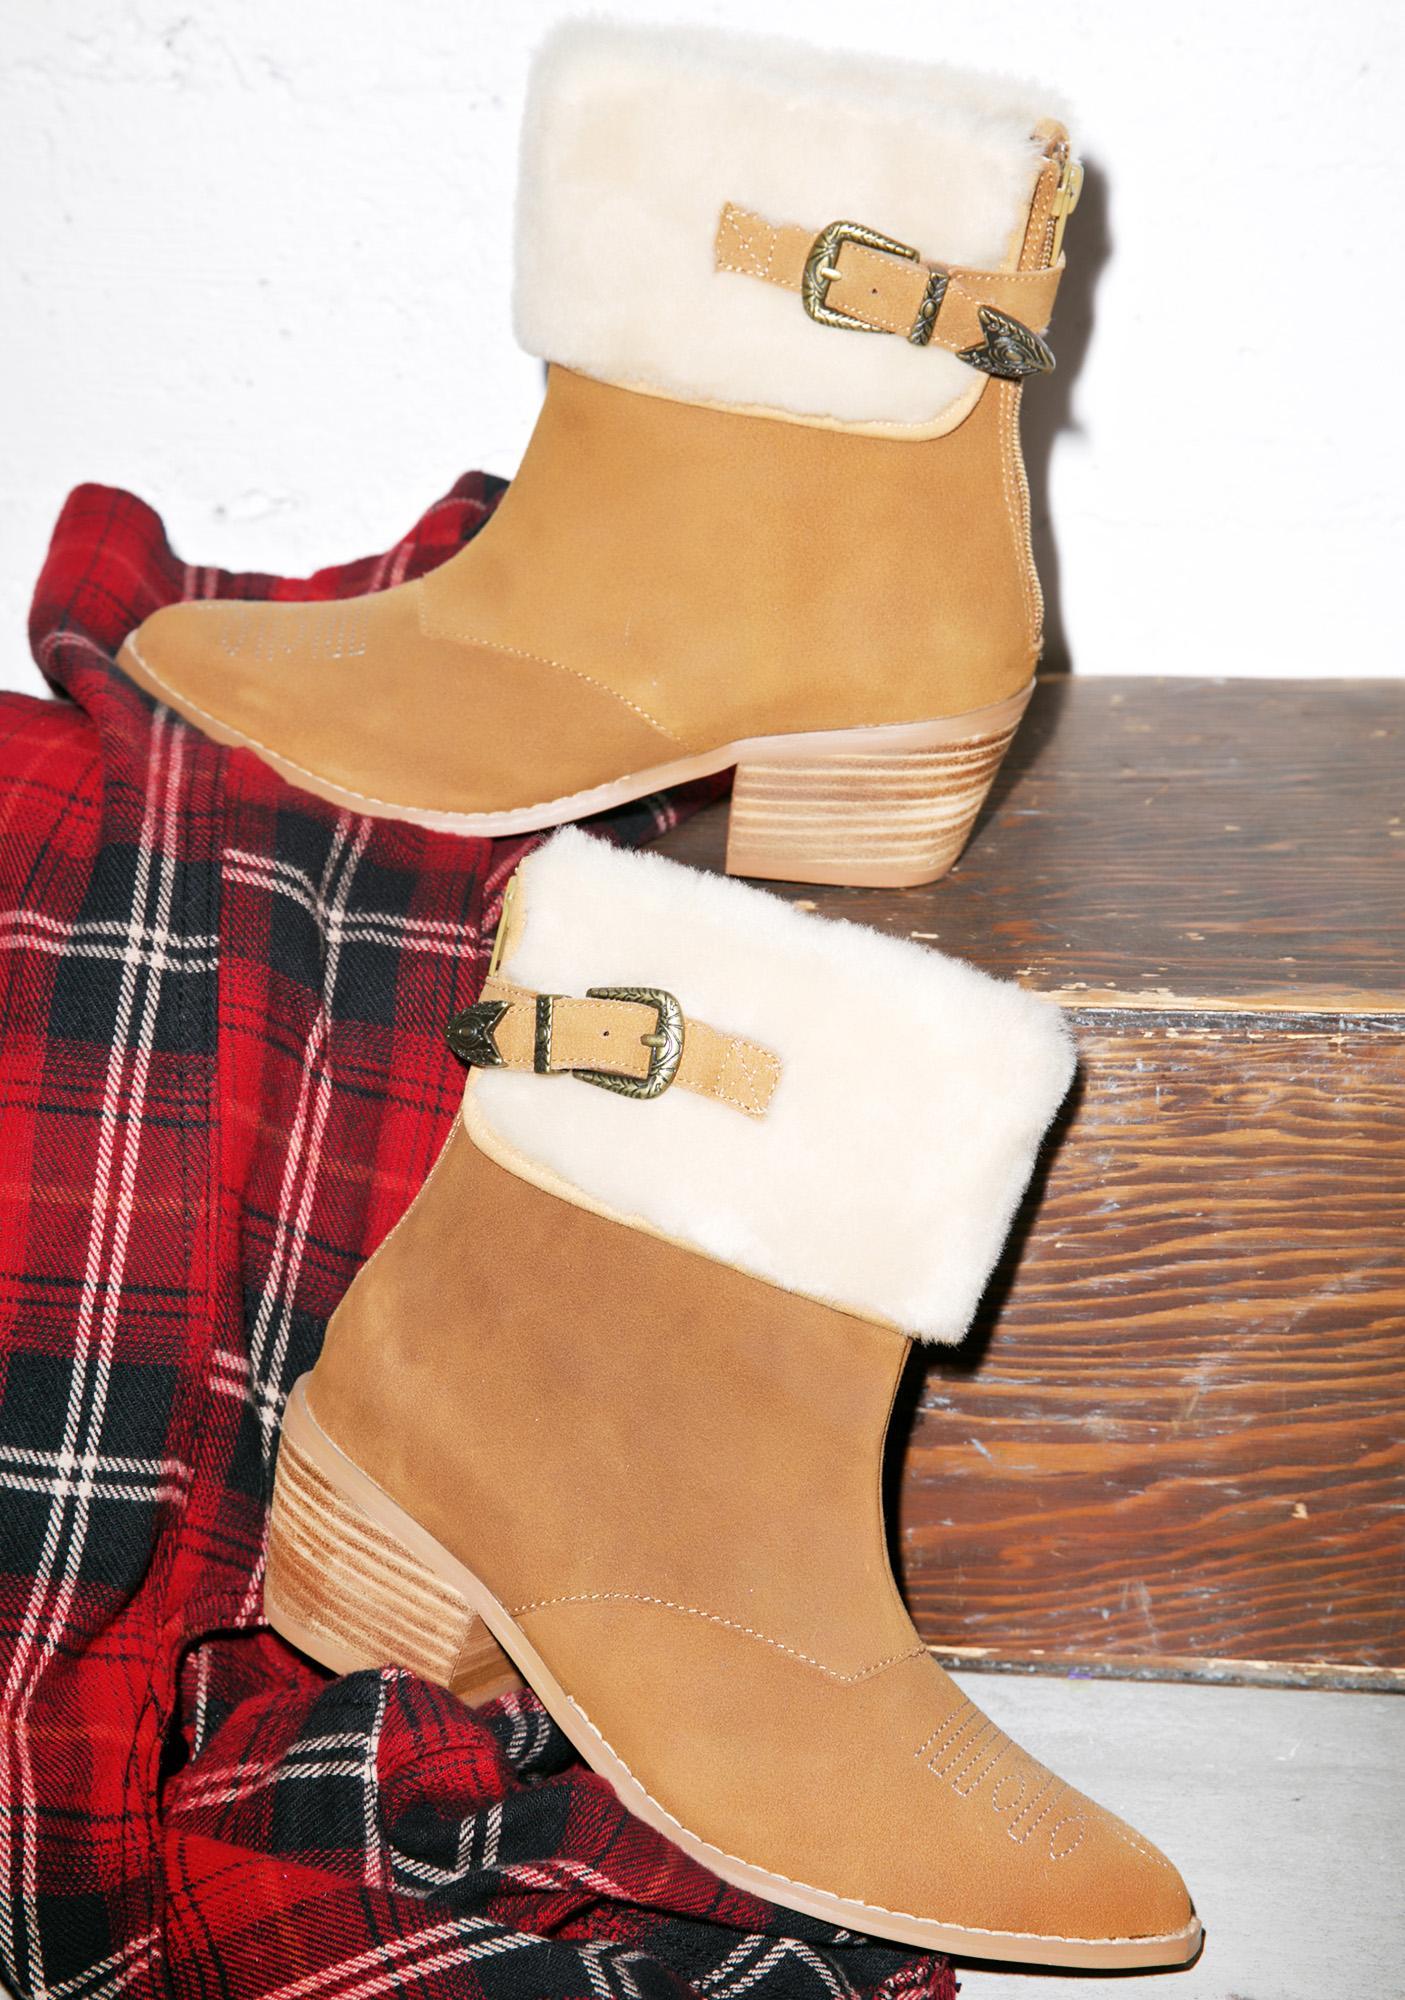 Nightwalker Lone Ranger Boots